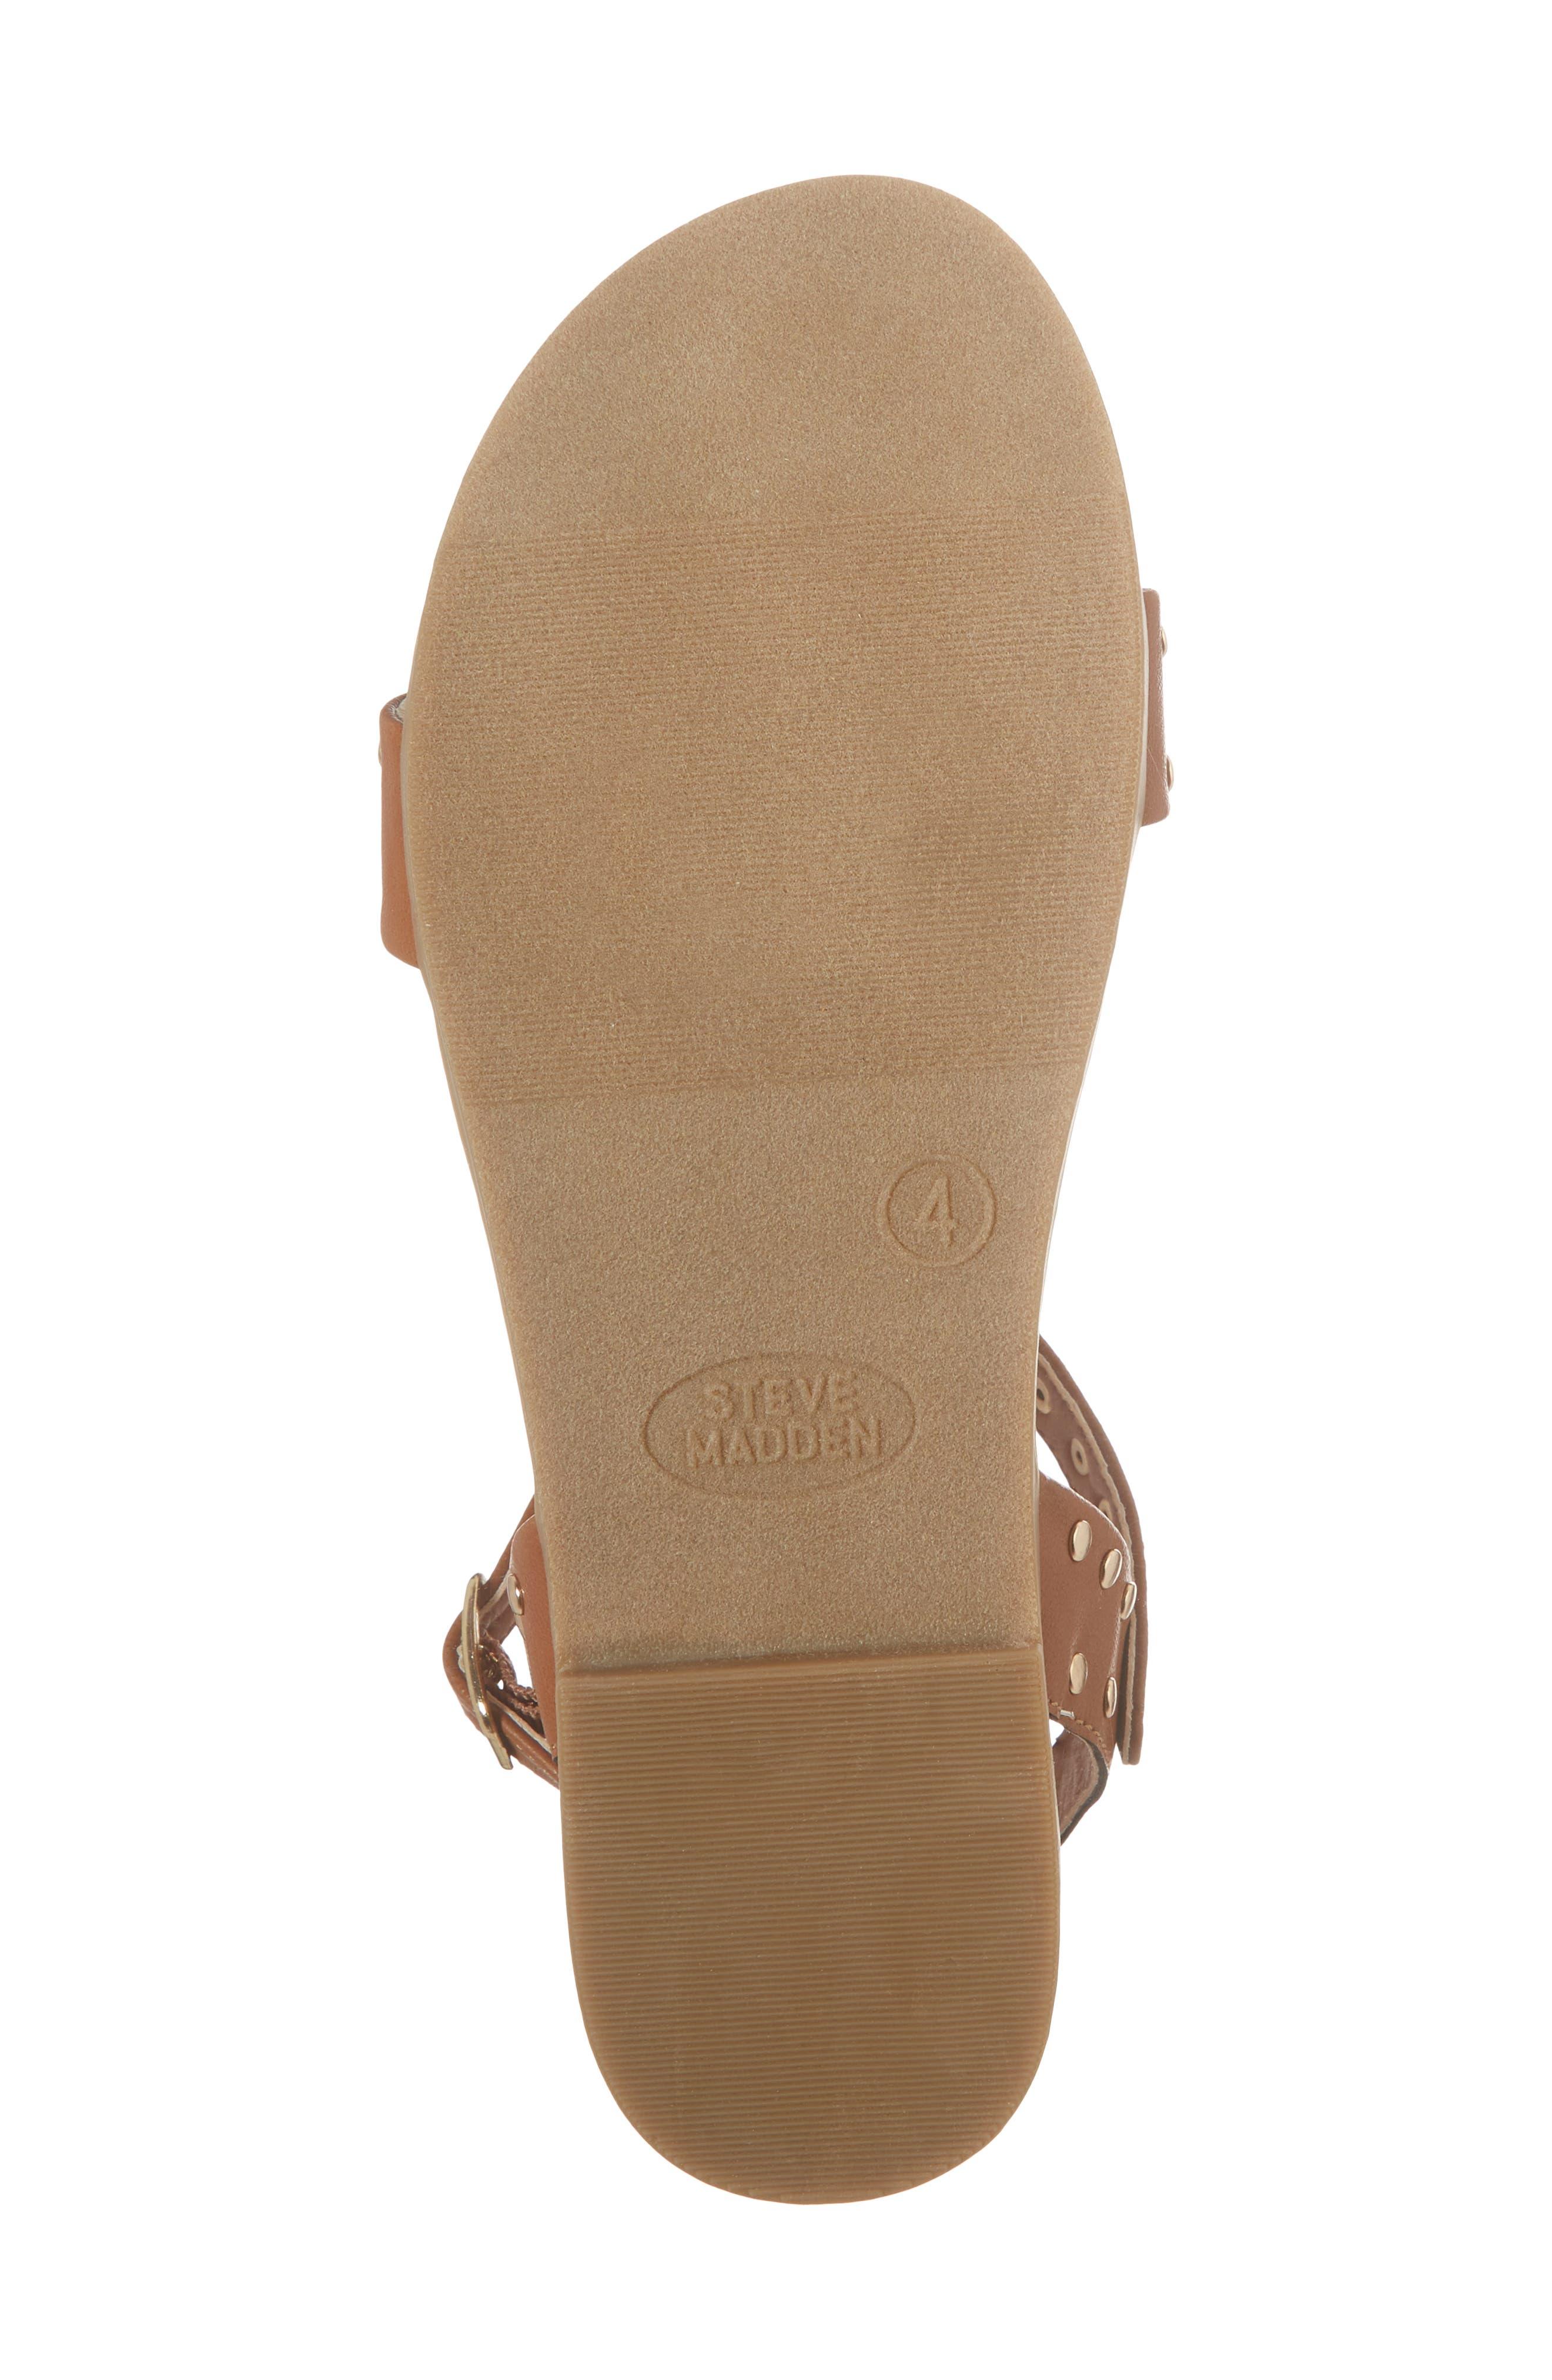 JDONDI Studded Sandal,                             Alternate thumbnail 6, color,                             Cognac